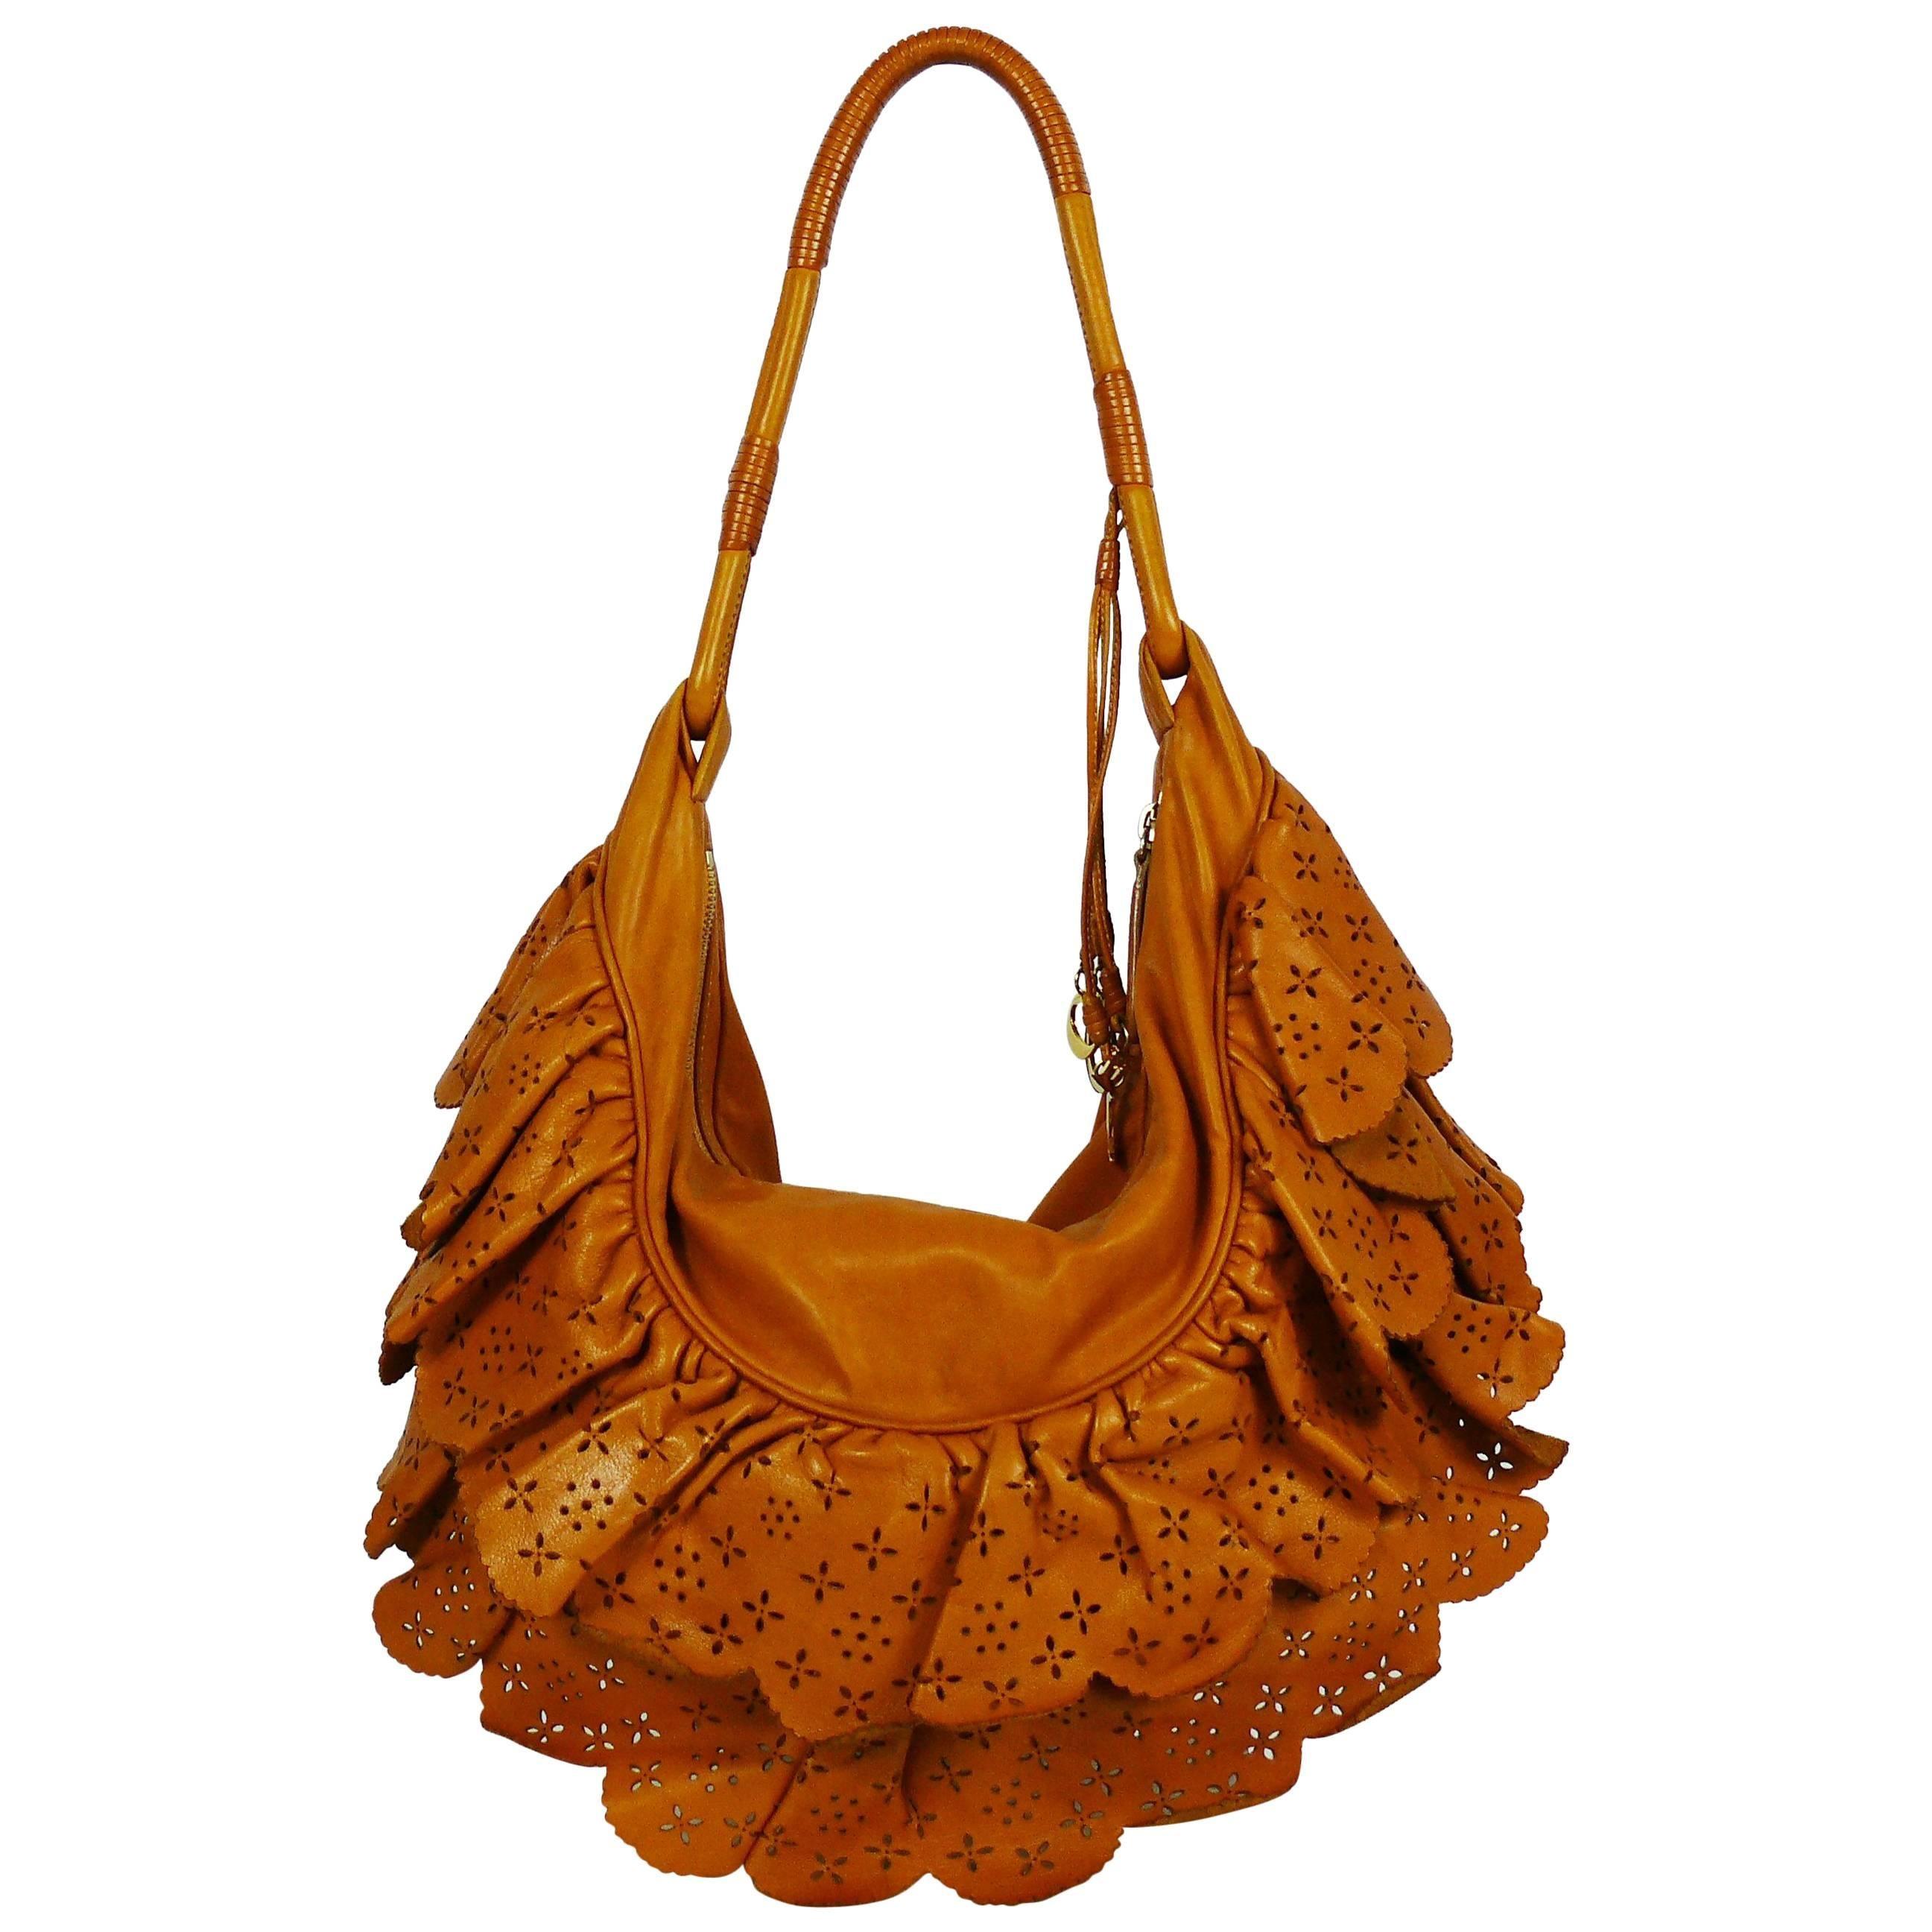 Christian Dior Washed Cognac Leather Gypsy Ruffle Bag